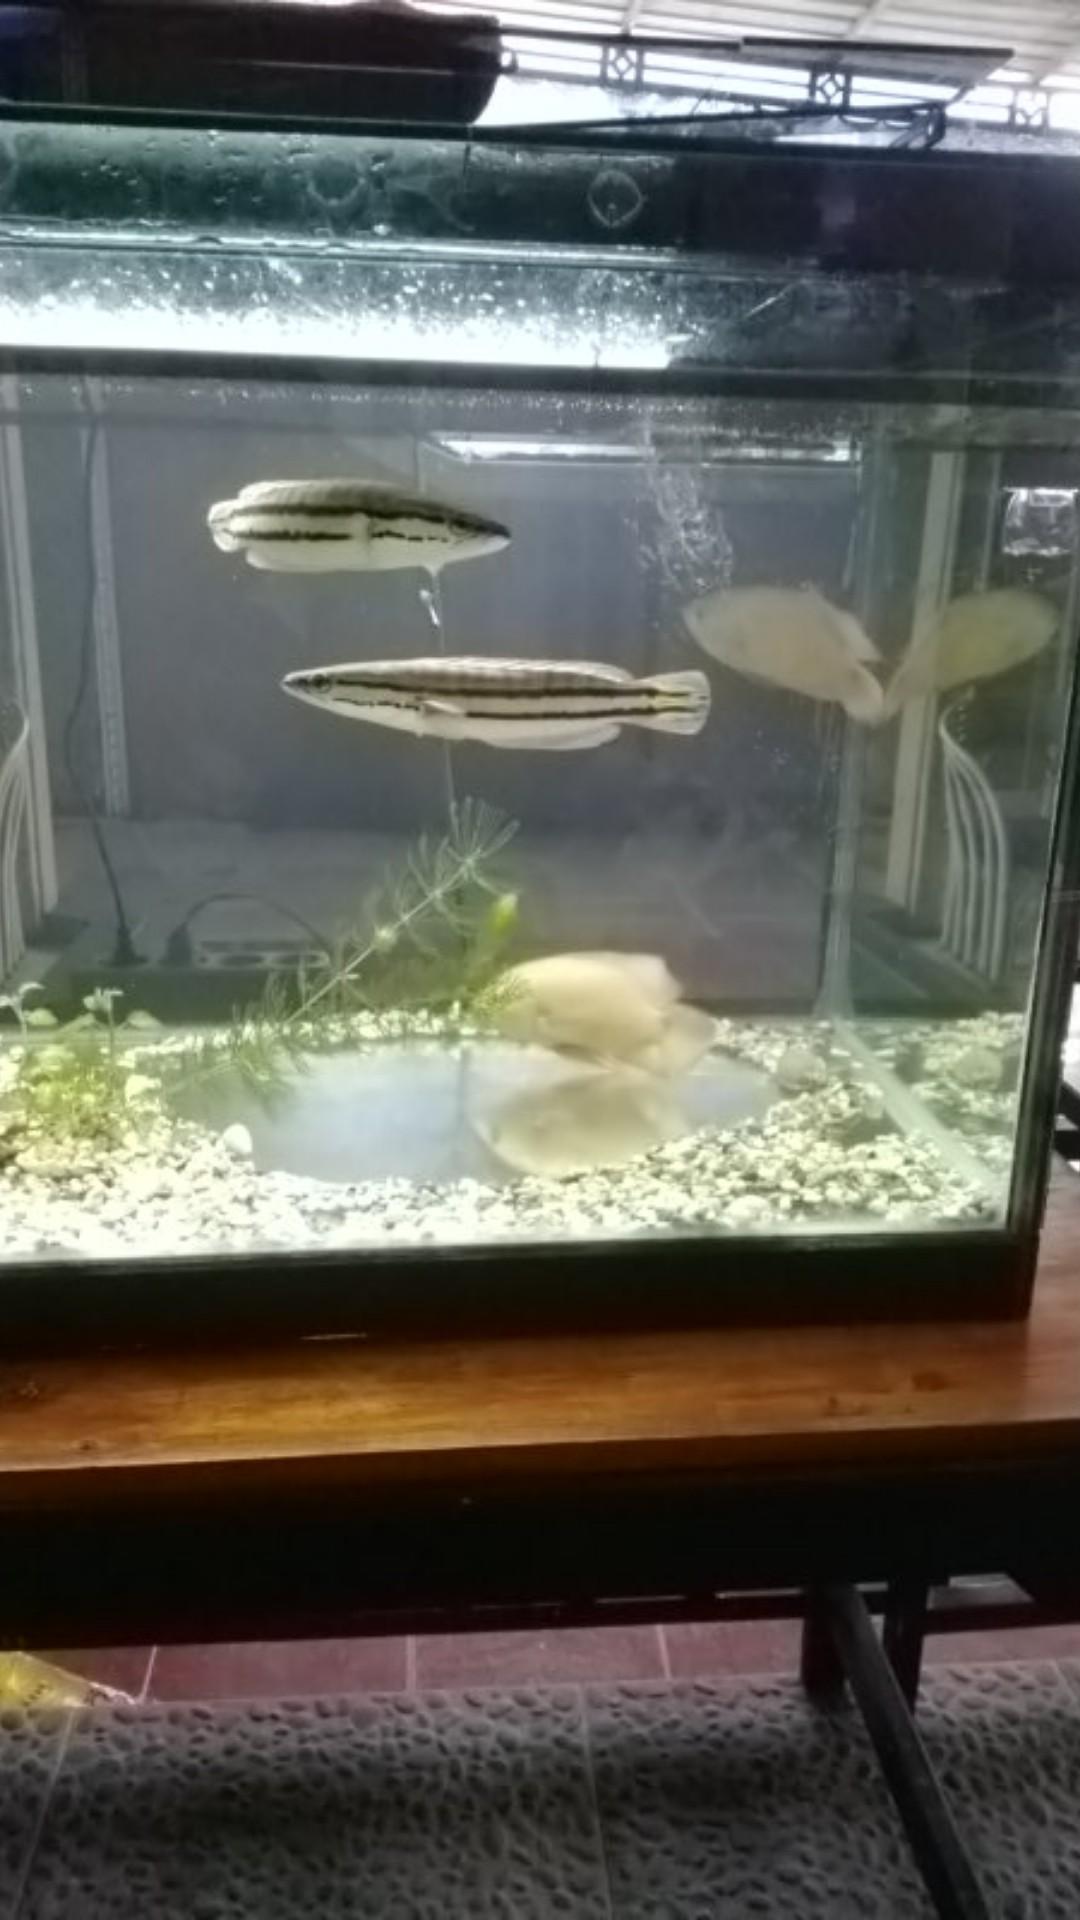 Harga Ikan Oscar Paris Albino : harga, oscar, paris, albino, Oscar, Paris, Albino, Shopee, Indonesia